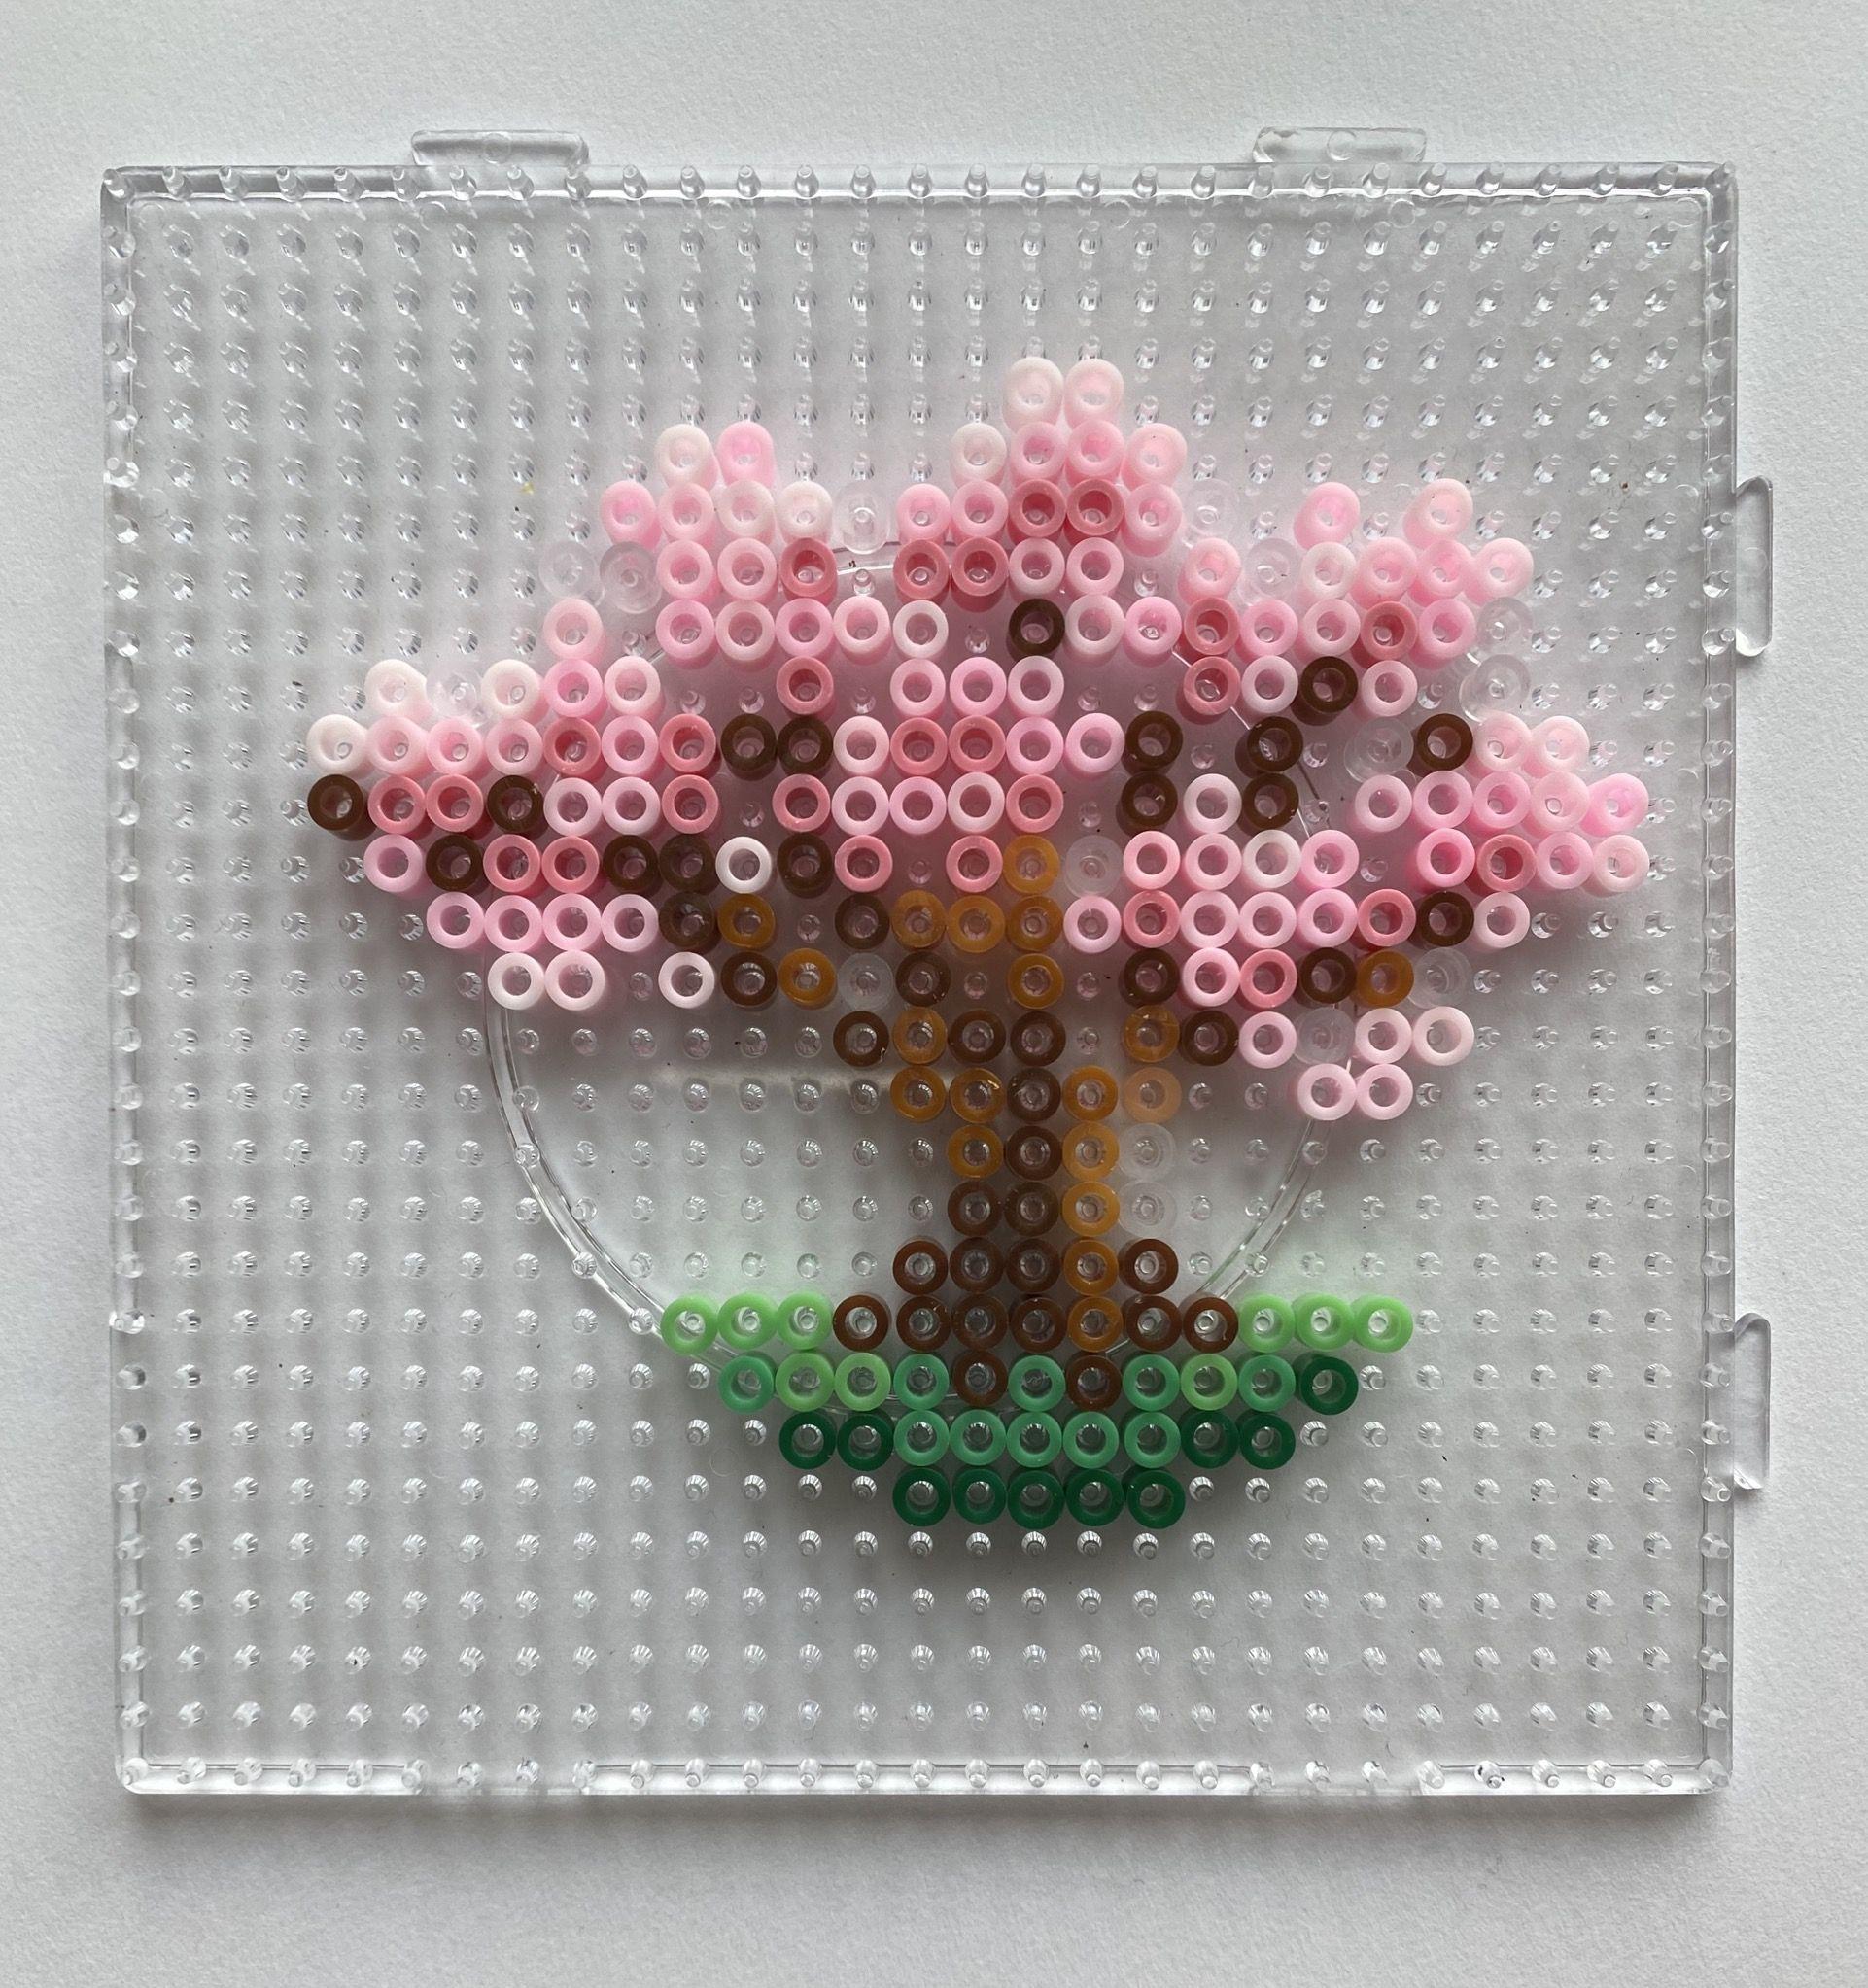 Cherry Blossom Tree Perler Beads In 2021 Hama Beads Design Hamma Beads Ideas Perler Bead Disney